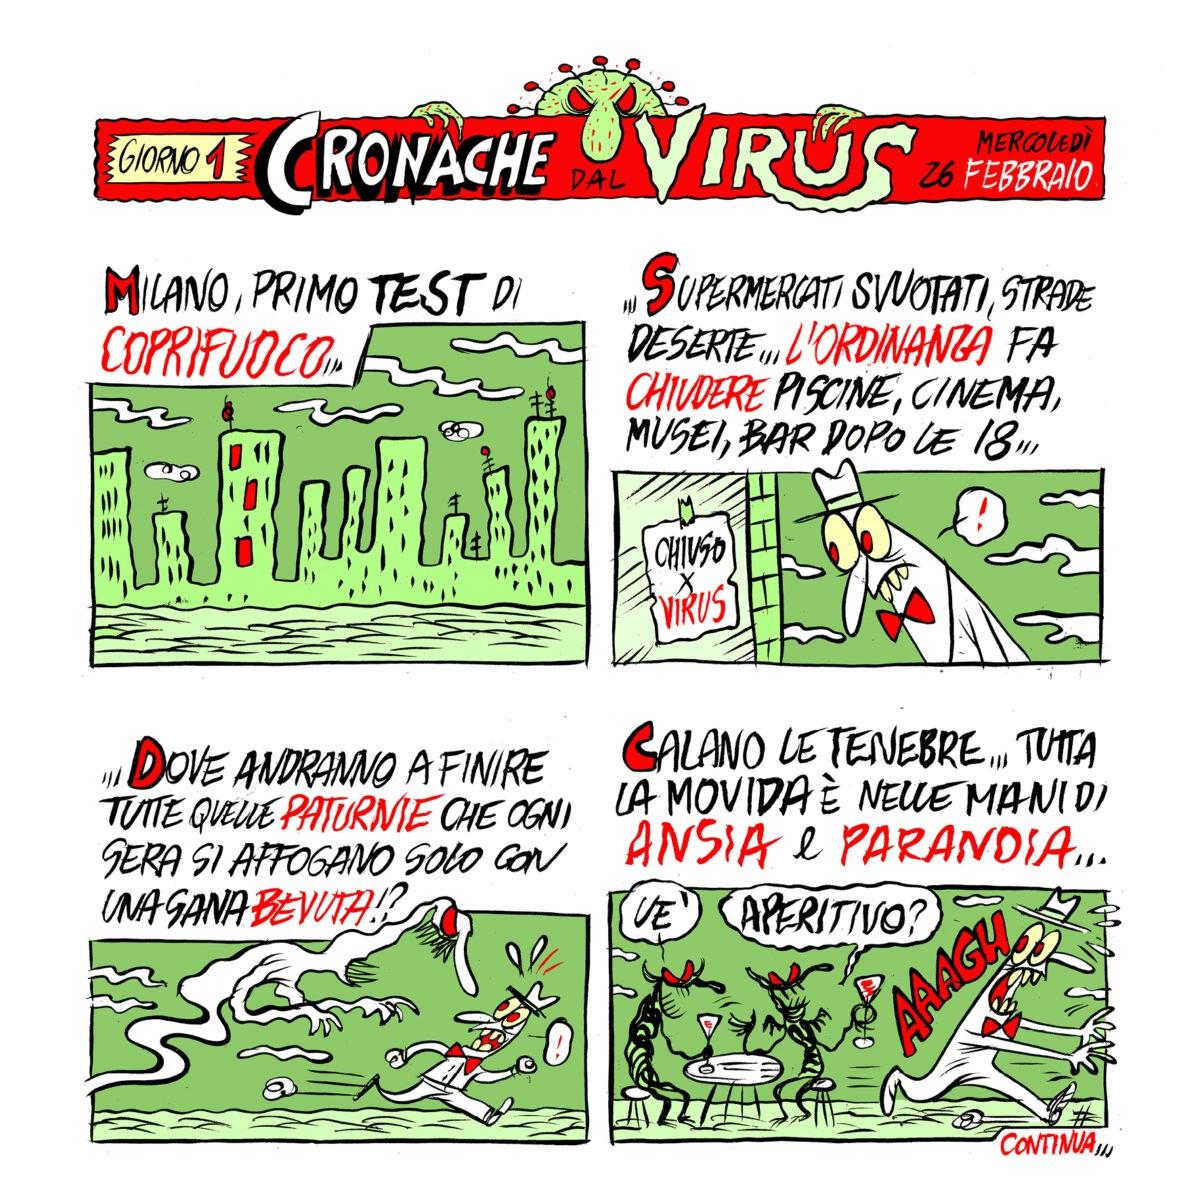 Cronache dal virus_